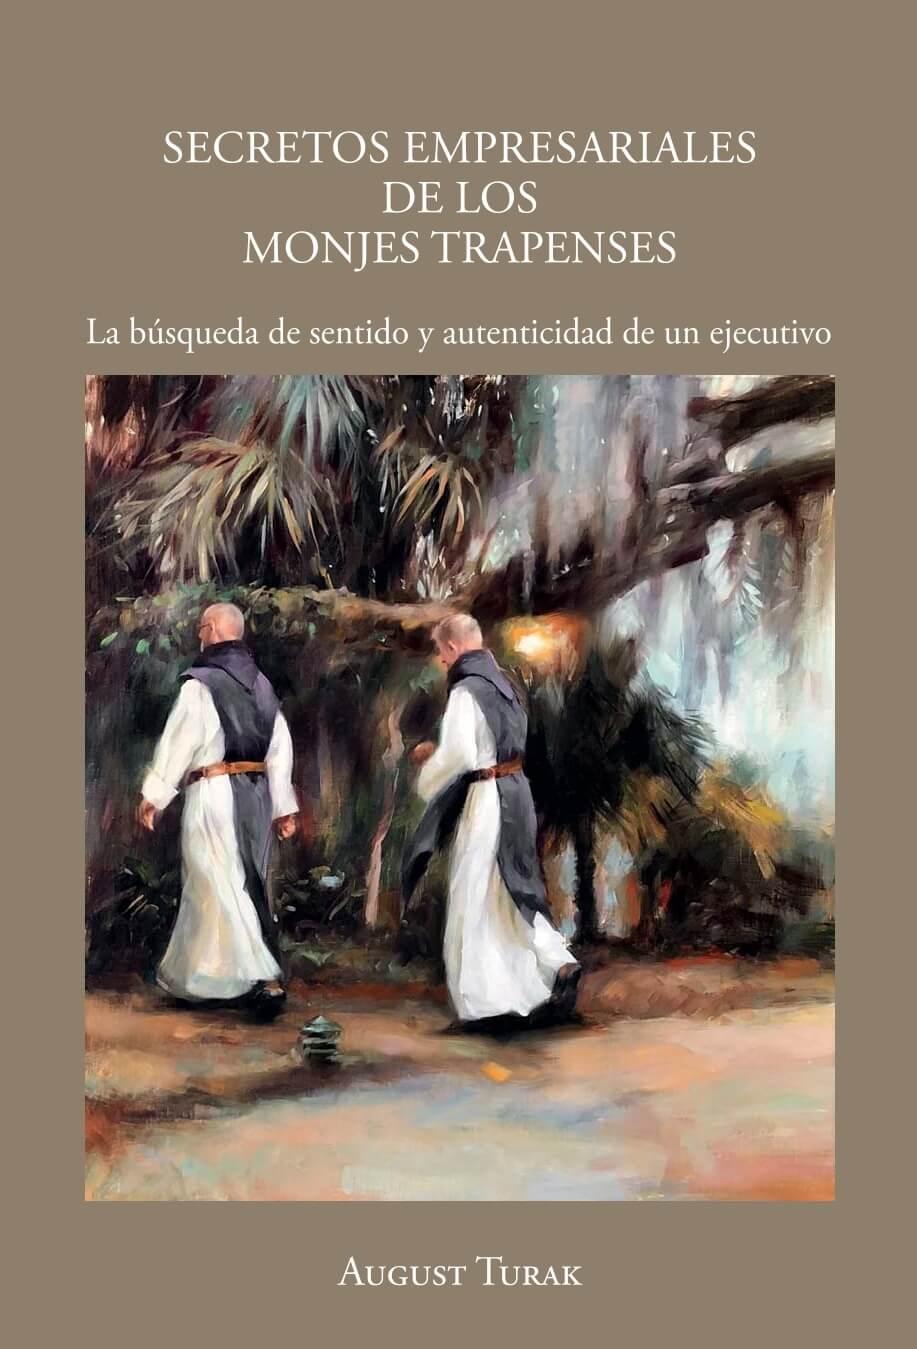 SECRETOS EMPRESARIALES DE LOS MONJES TRAPENSES 1